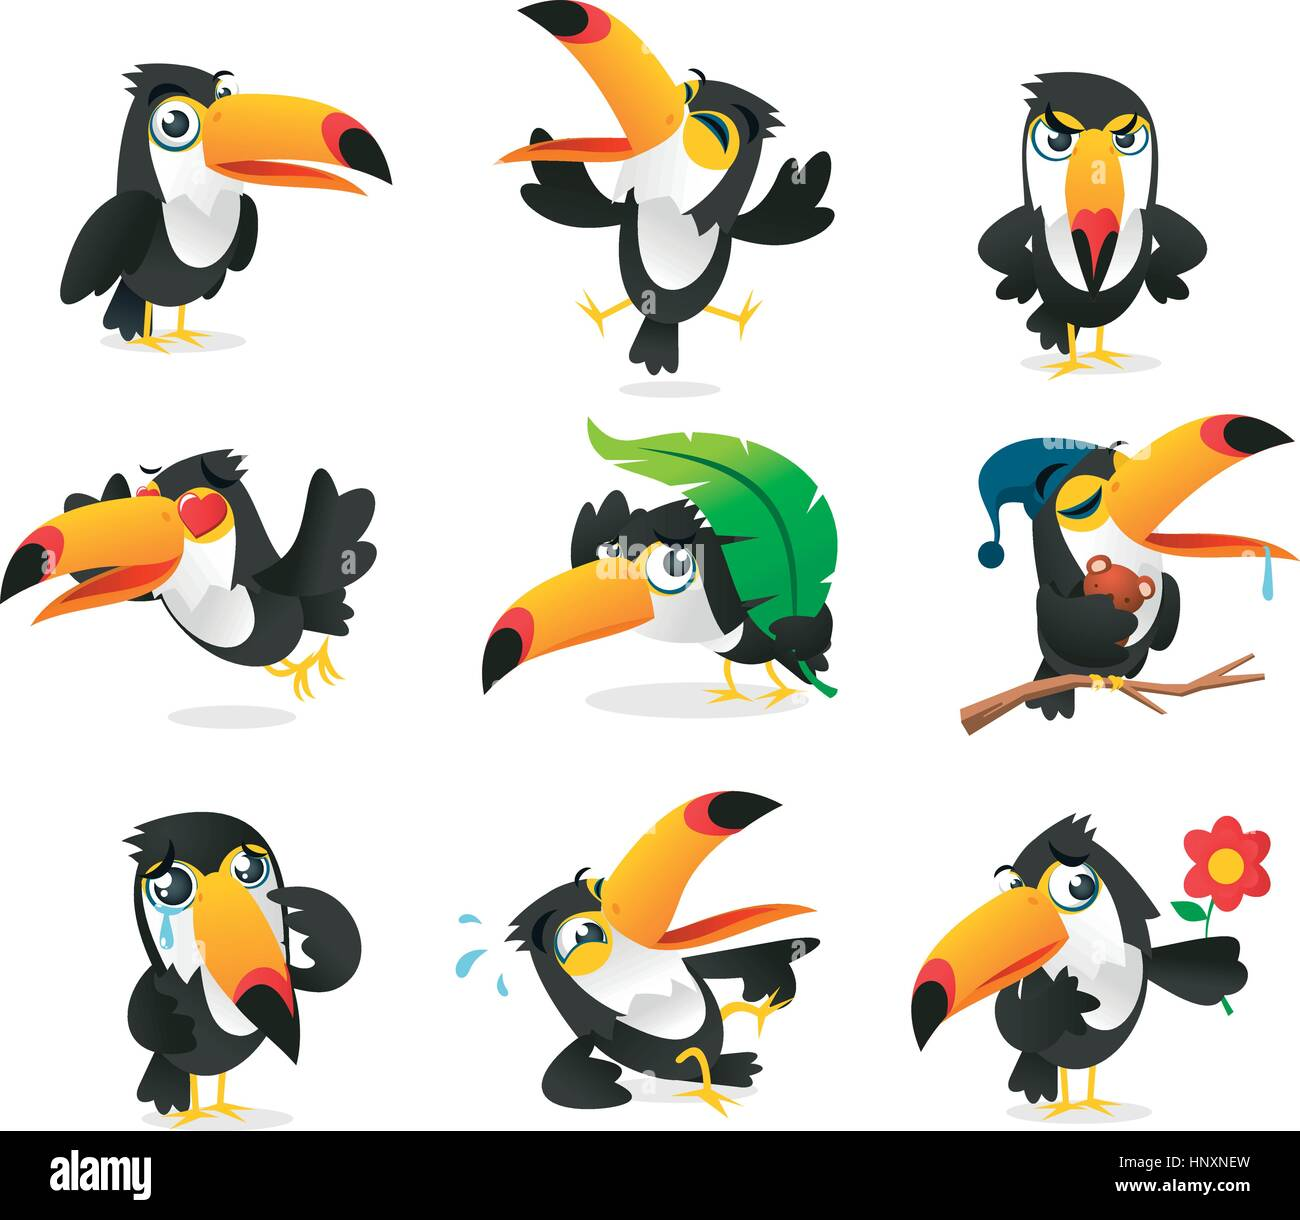 Guinness Toucan Mascot Tattoo: Toucan Mascot Photos & Toucan Mascot Images